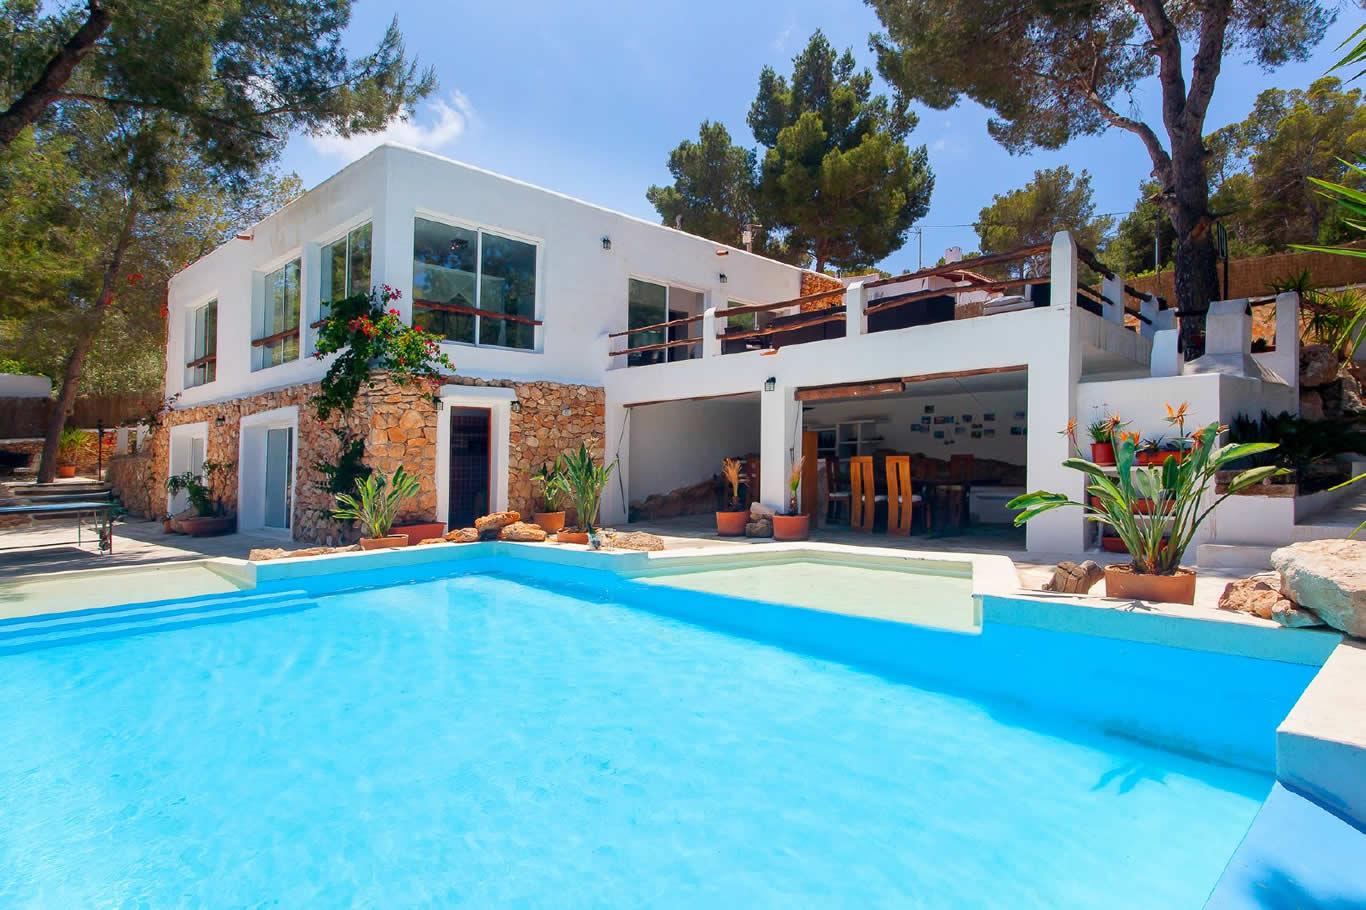 Alquiler de casa rural con piscina en ibiza villa ves for Alquiler de piscinas